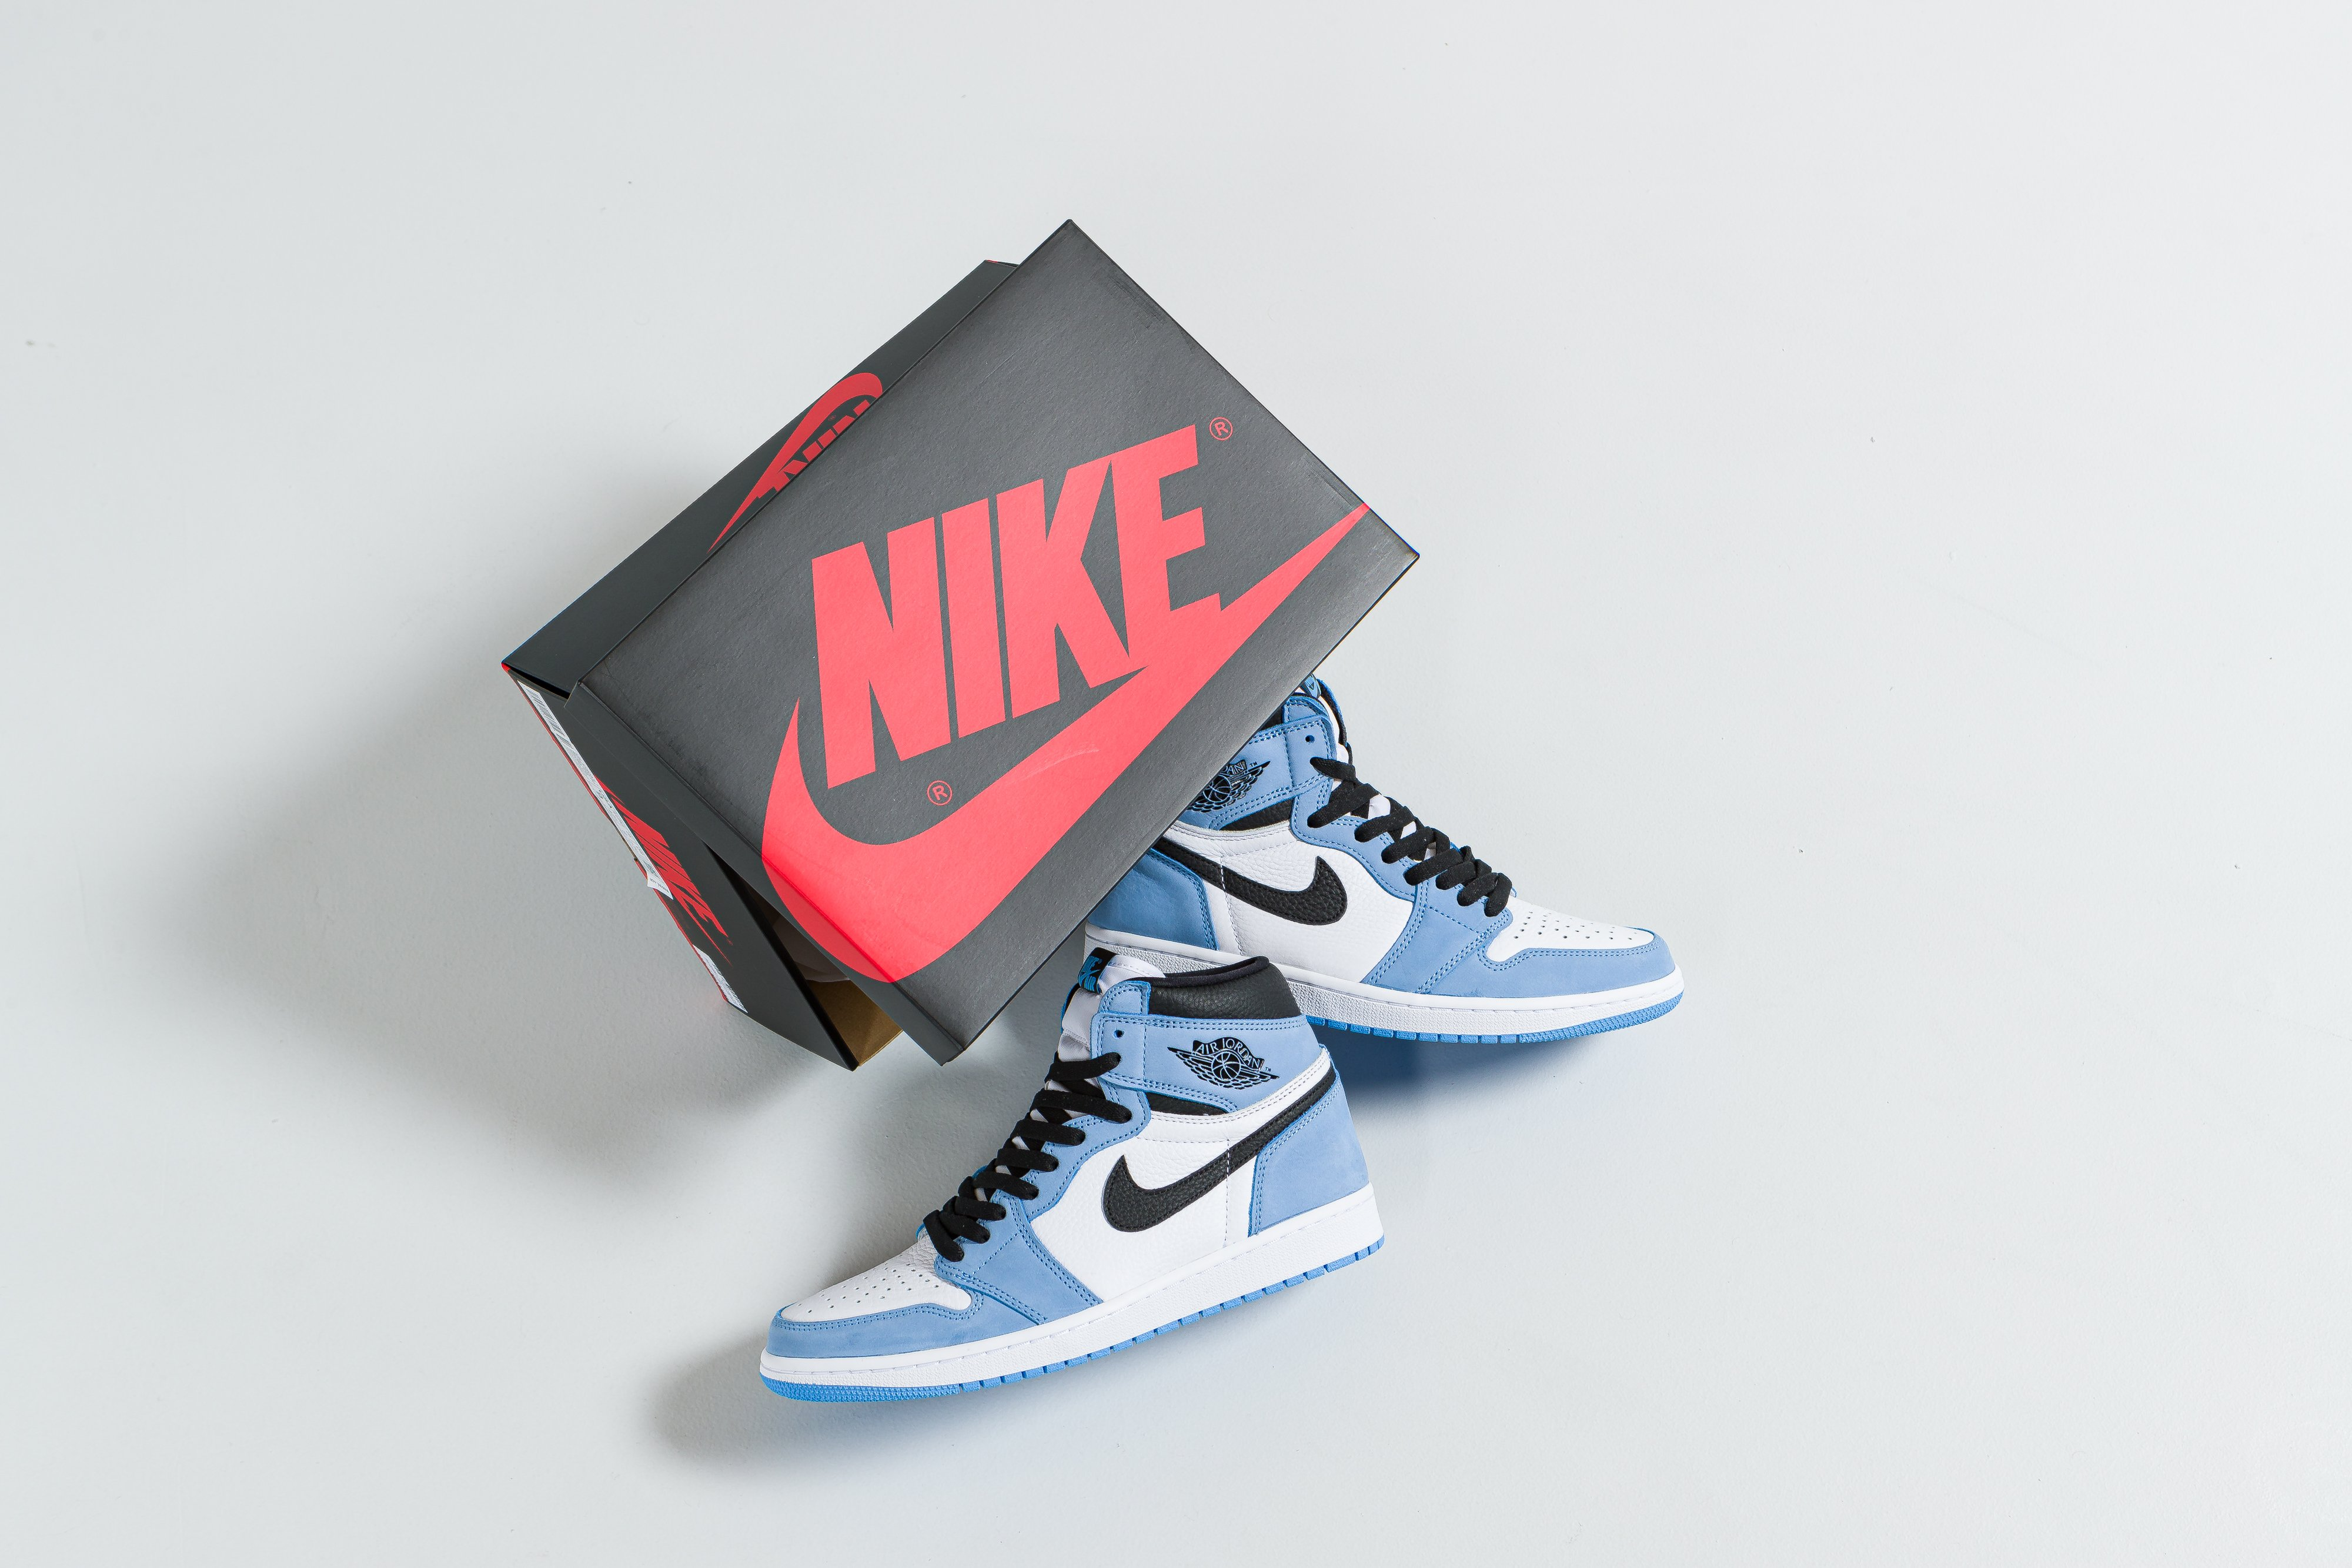 Up There Launches - Nike Air Jordan 1 Retro Hi 'University Blue'